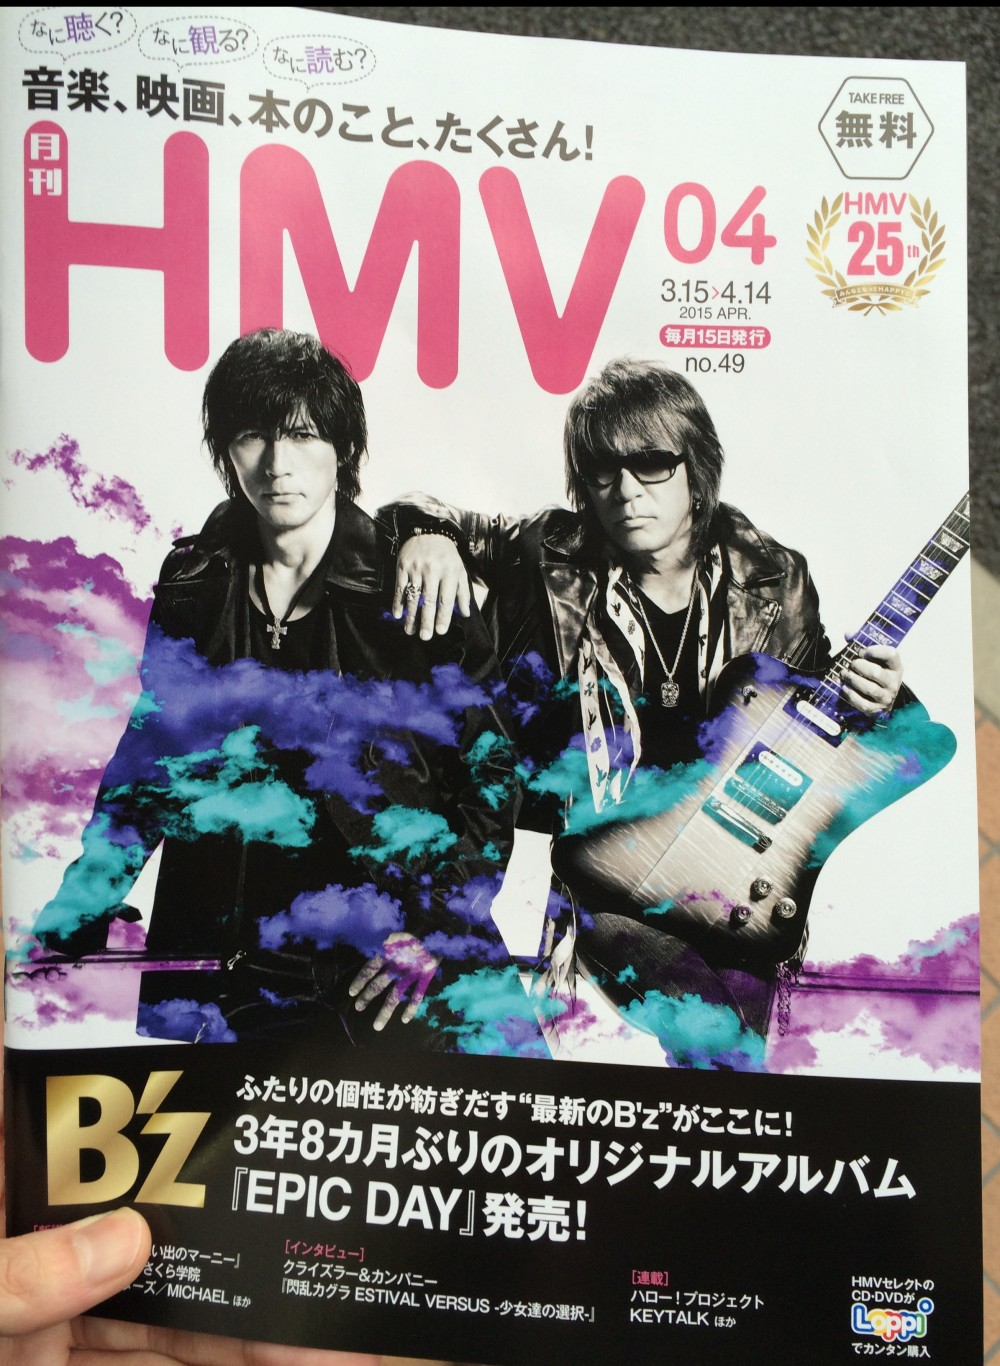 B'z表紙、巻頭の「月刊HMV 」2015,4月号をゲット!!